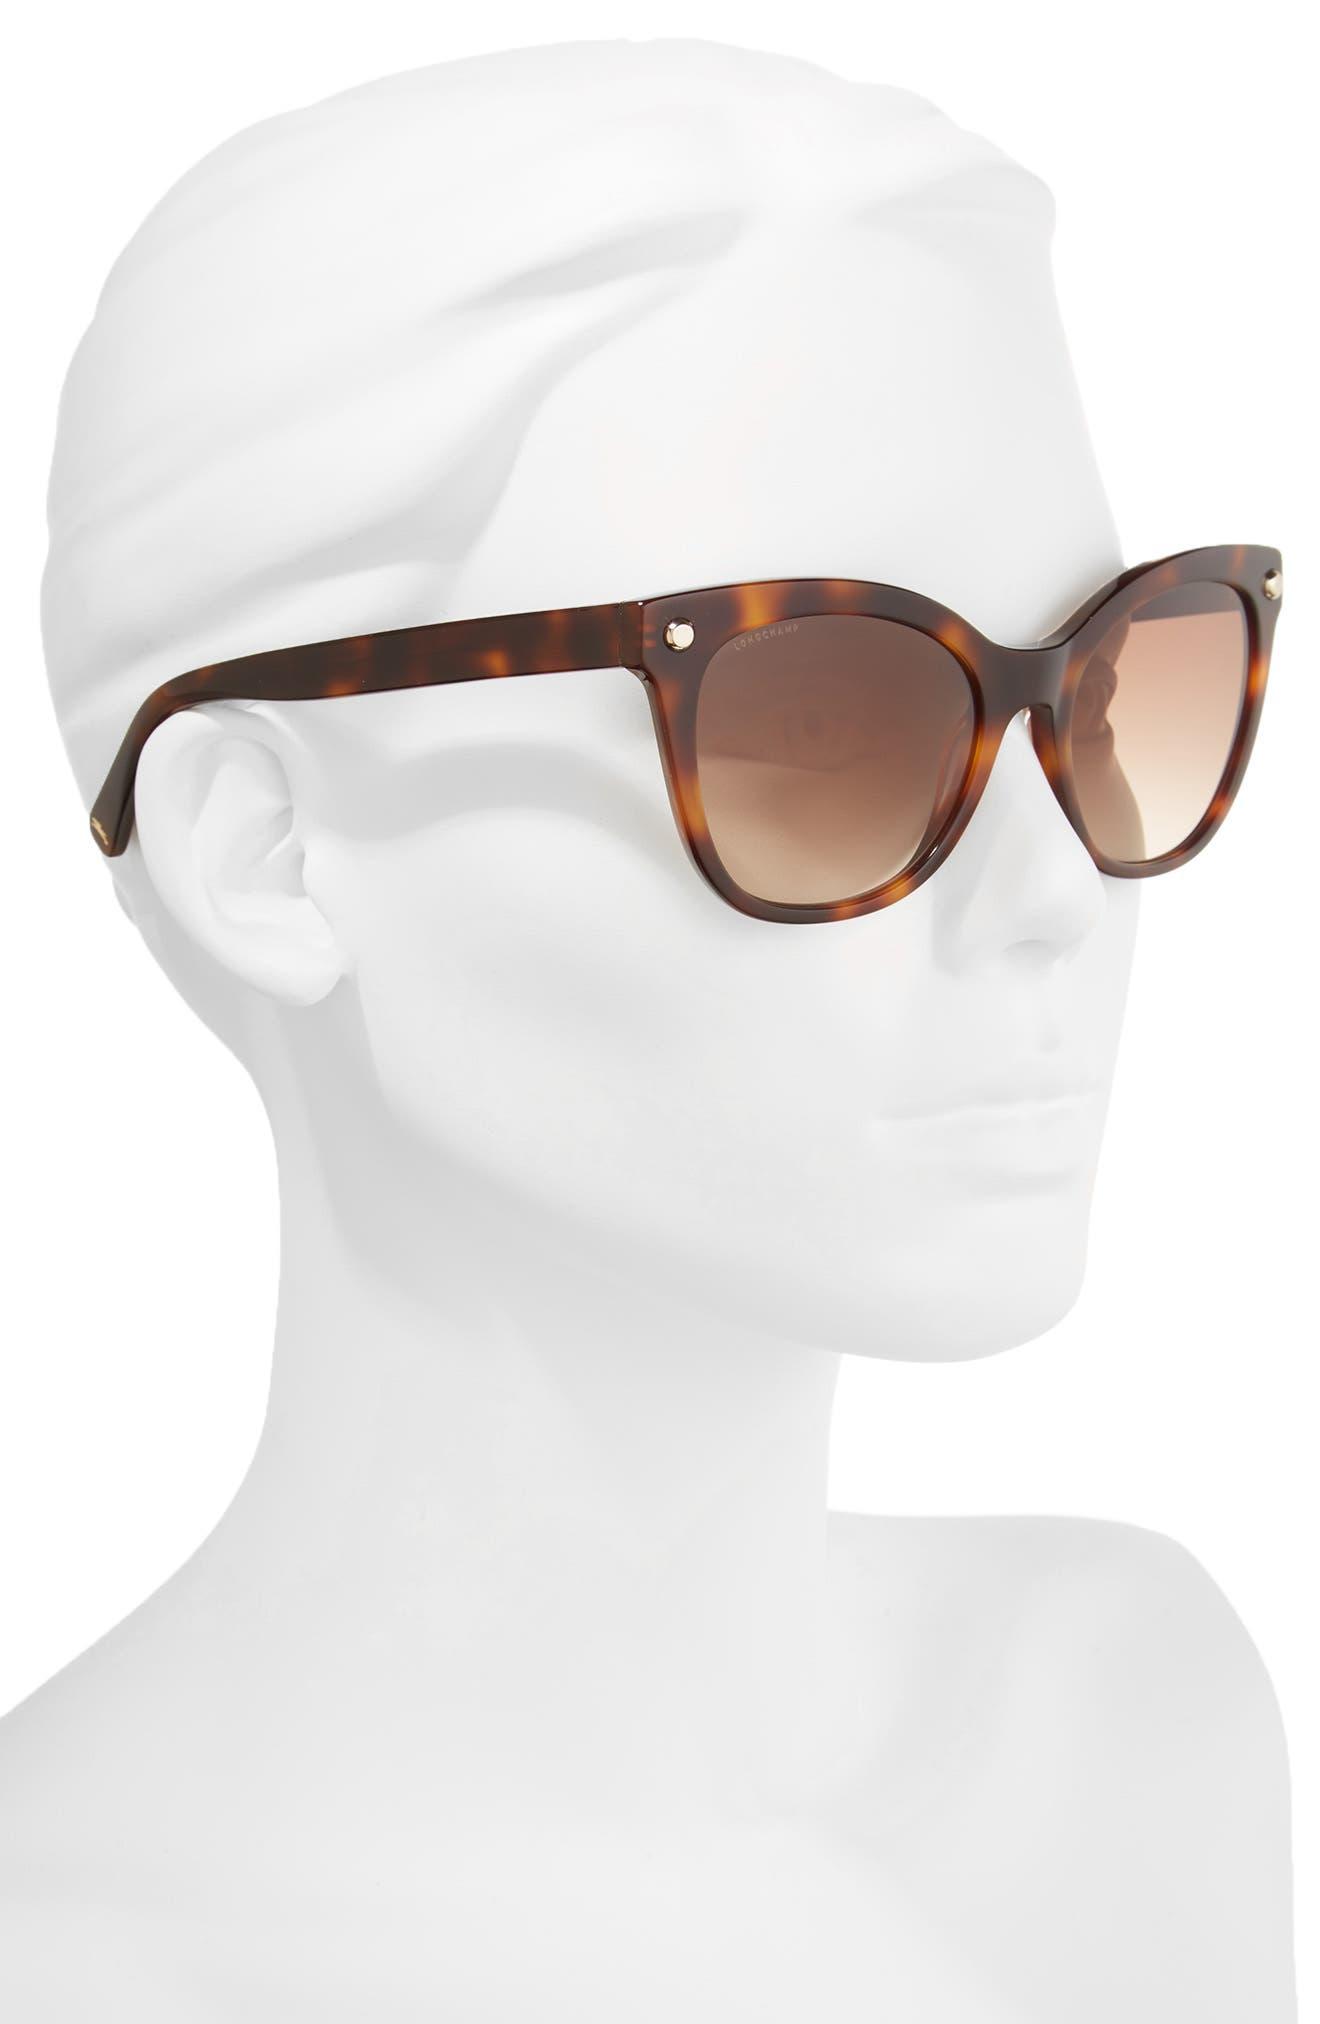 55mm Cat Eye Sunglasses,                             Alternate thumbnail 2, color,                             Blonde Havana